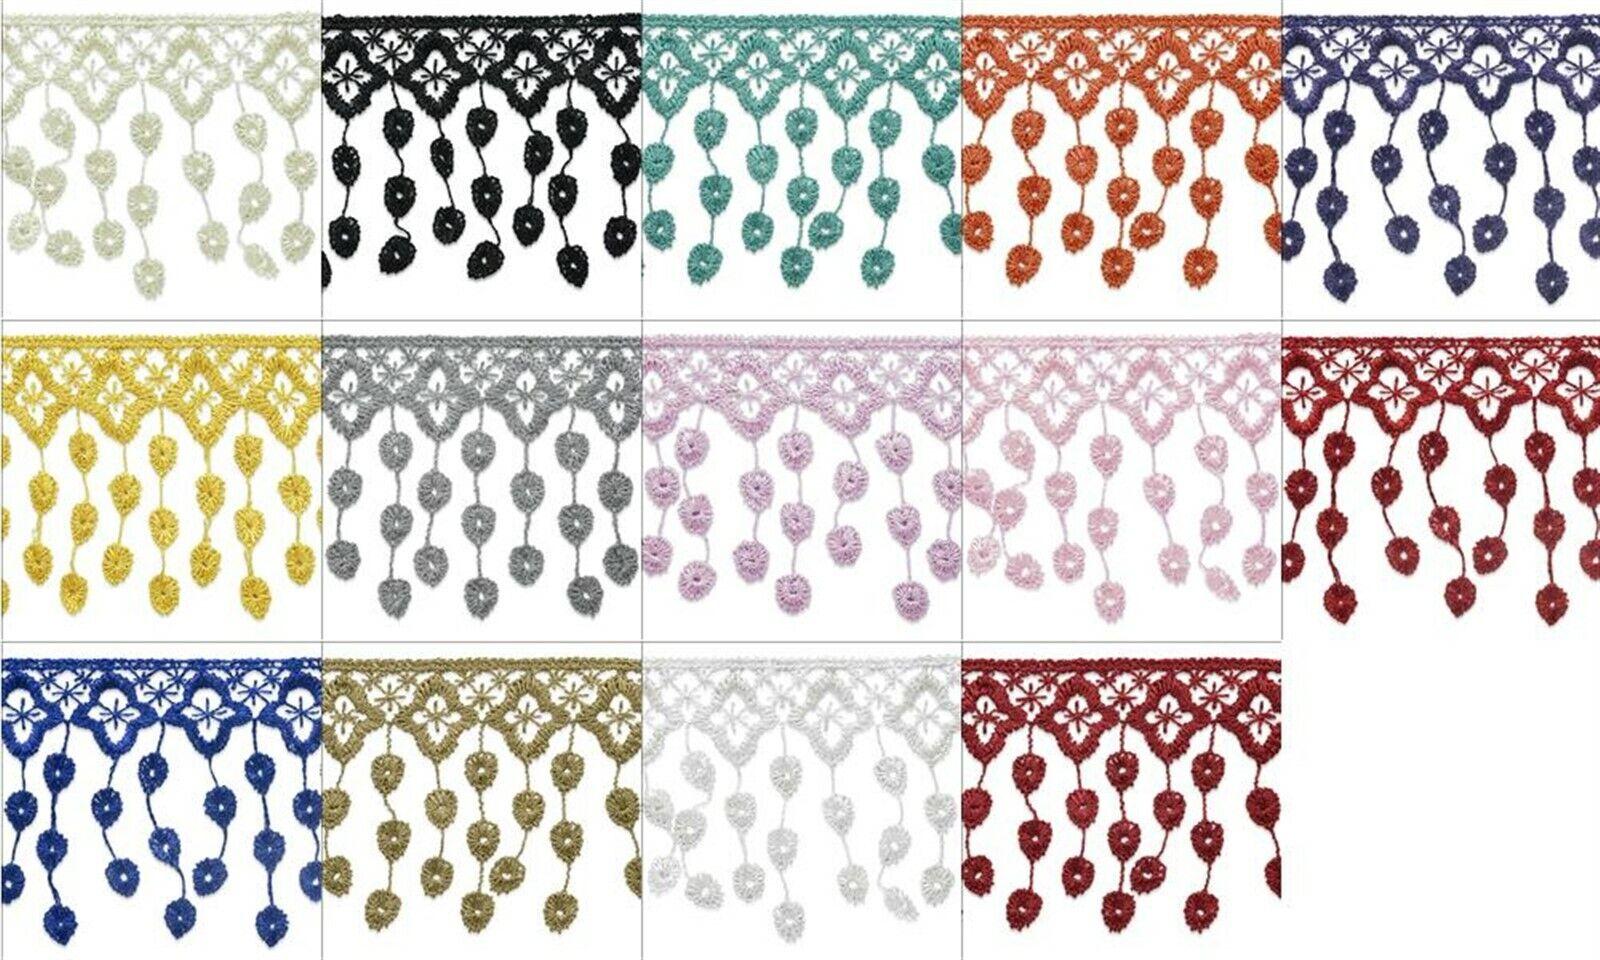 Expo 5 yards of Paillette Sequin Bead Fringe Trim